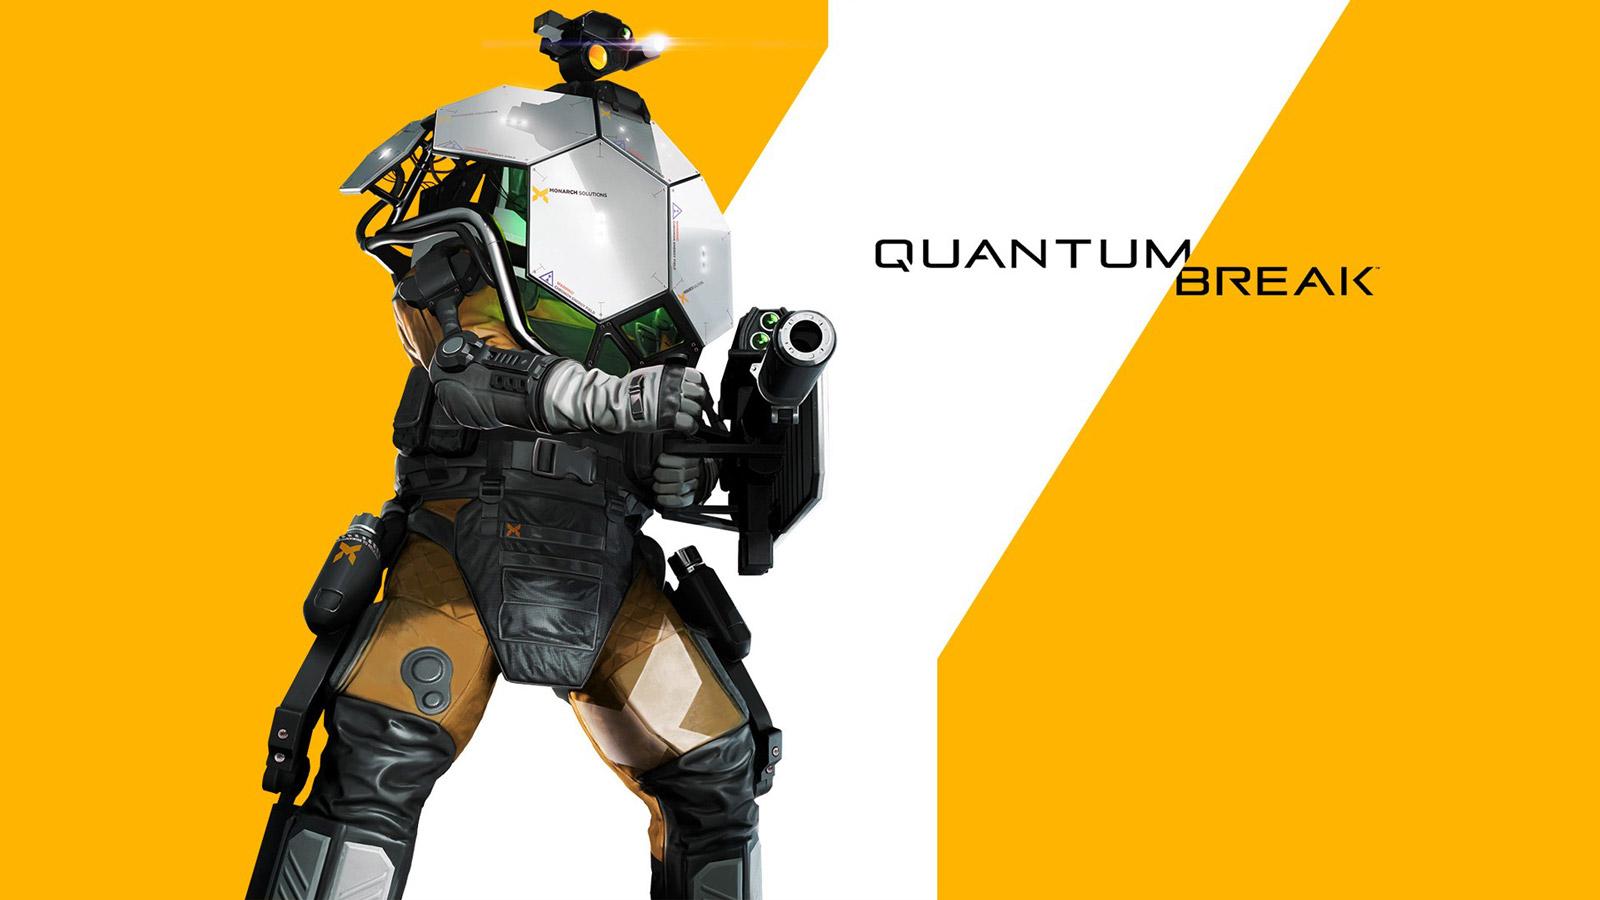 Quantum Break Wallpaper in 1600x900